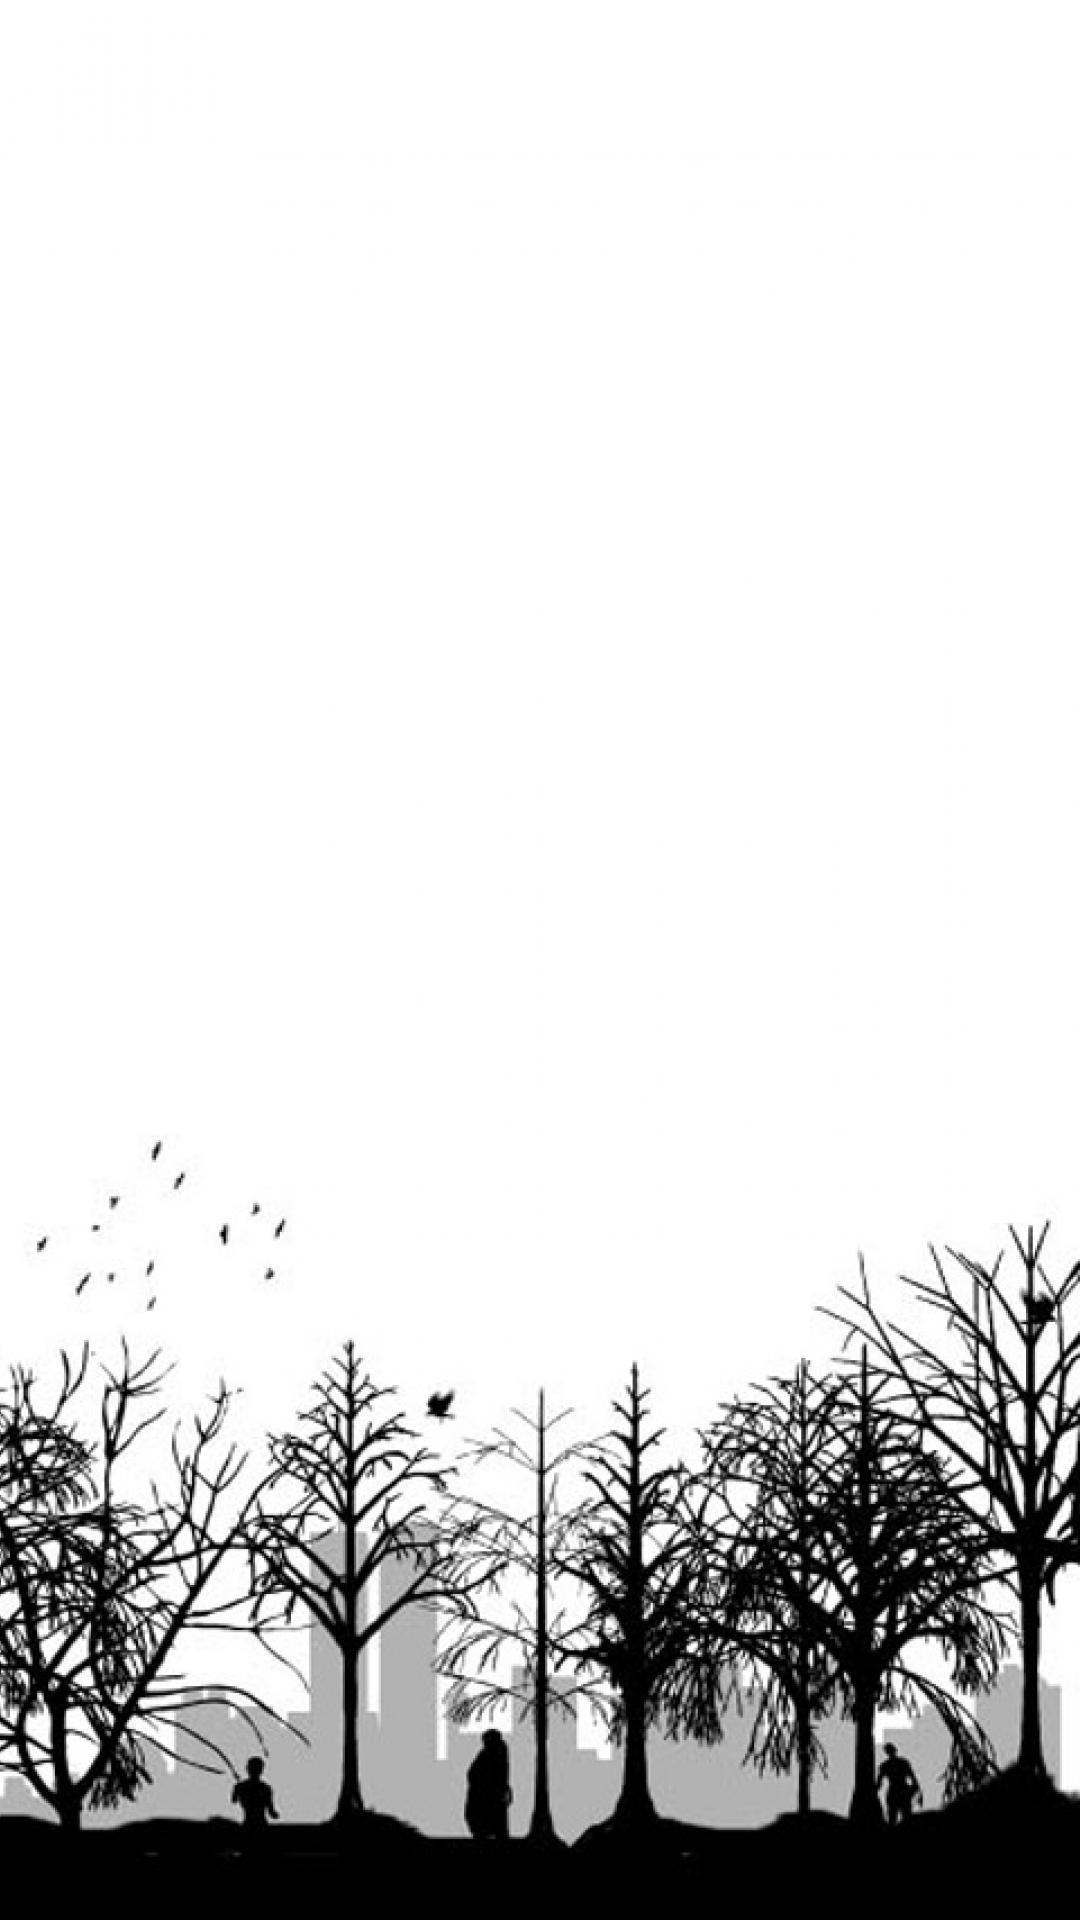 Free Anime Wallpaper Hd Anime Cg Artwork Black Hair Illustration Games 465966 Wallpaperuse